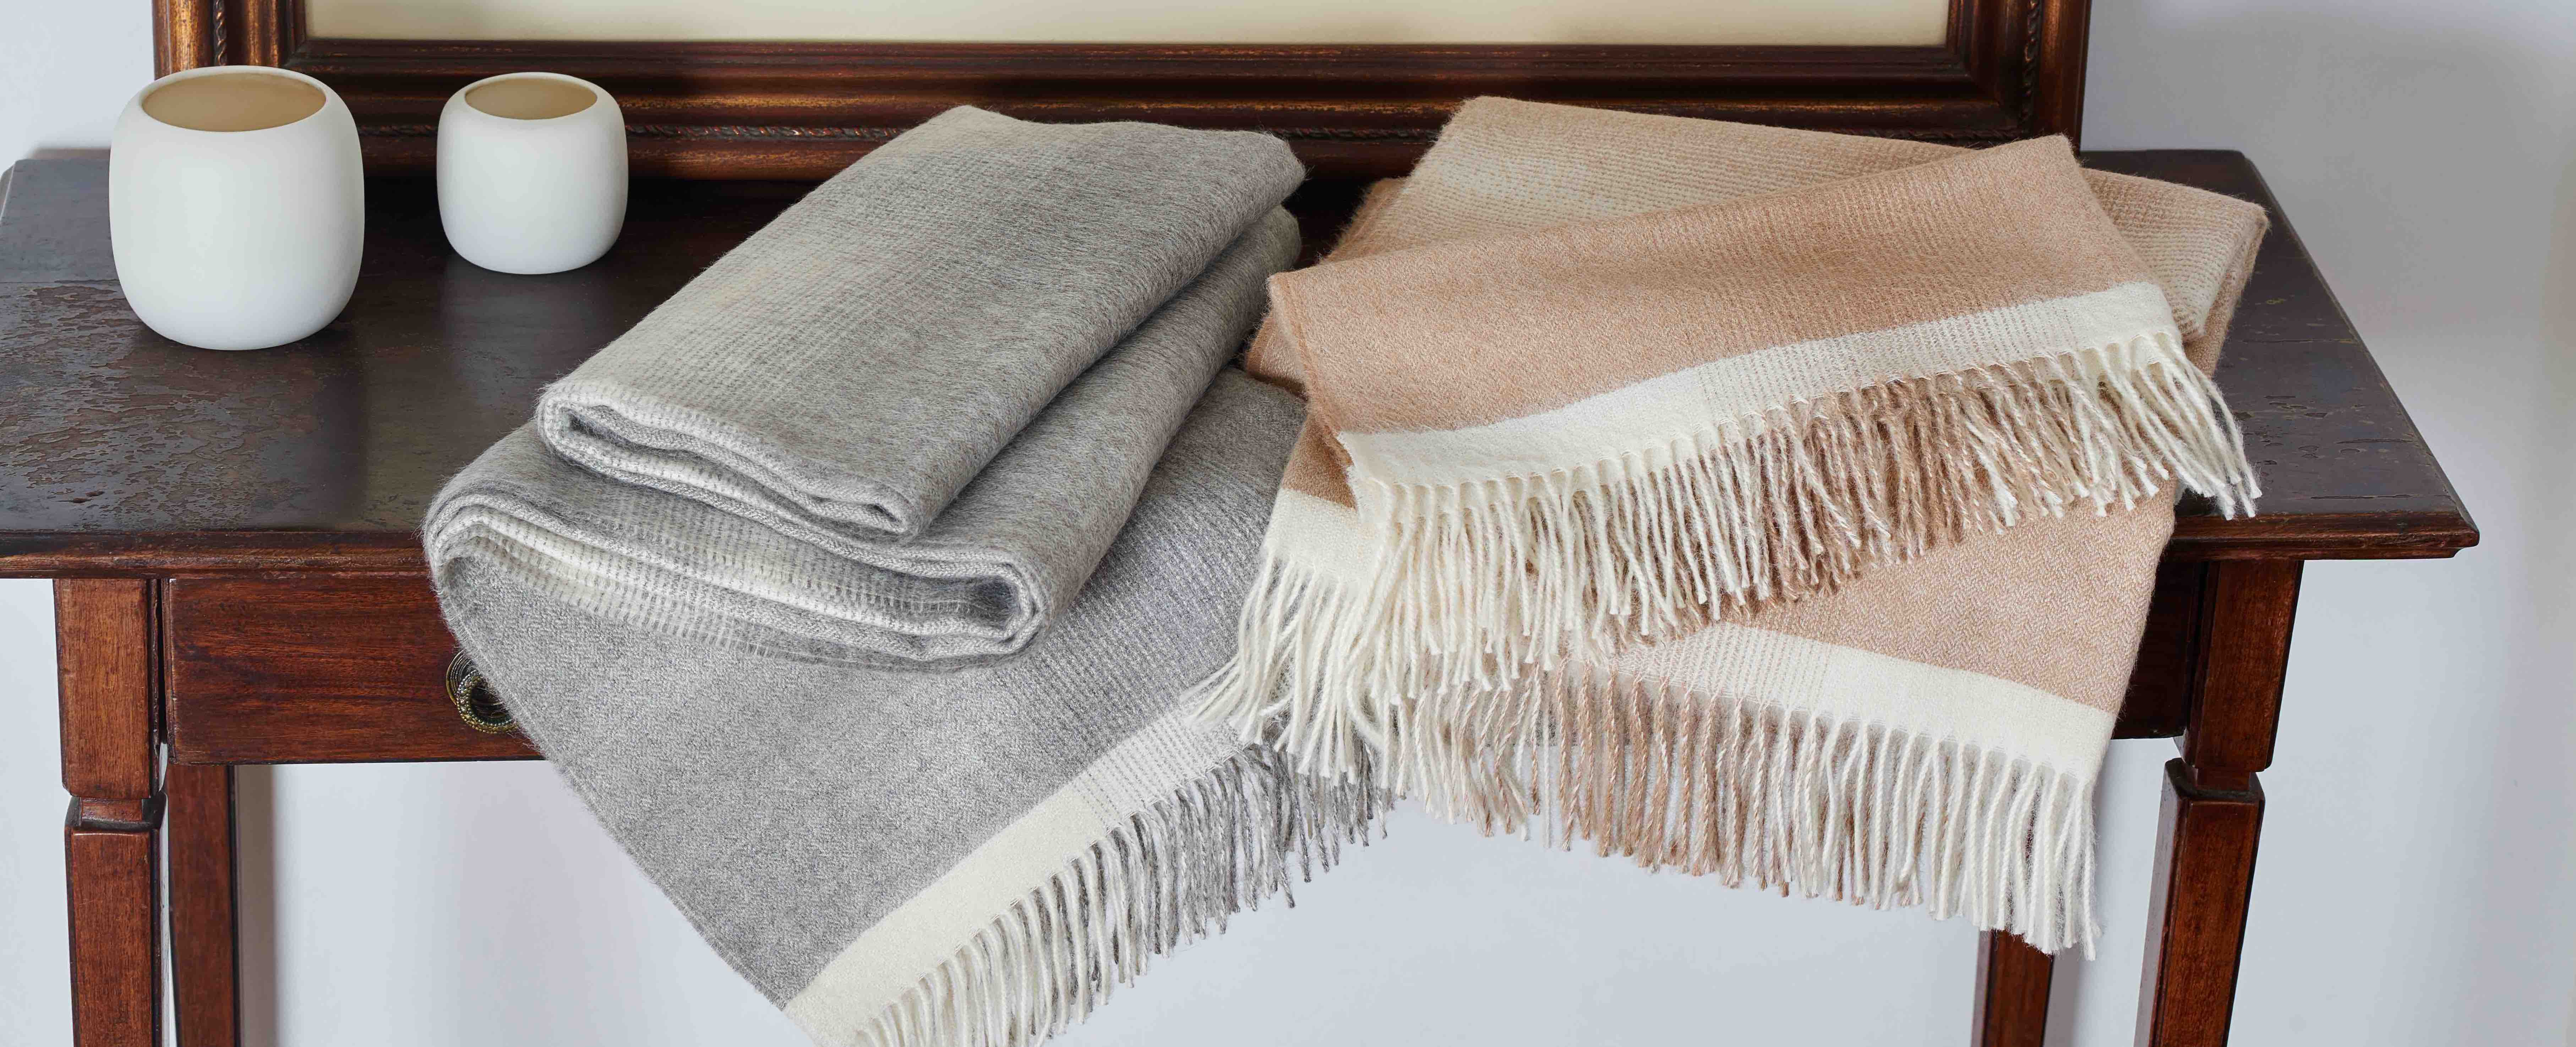 Alpaca Blankets & Throws - Home Line